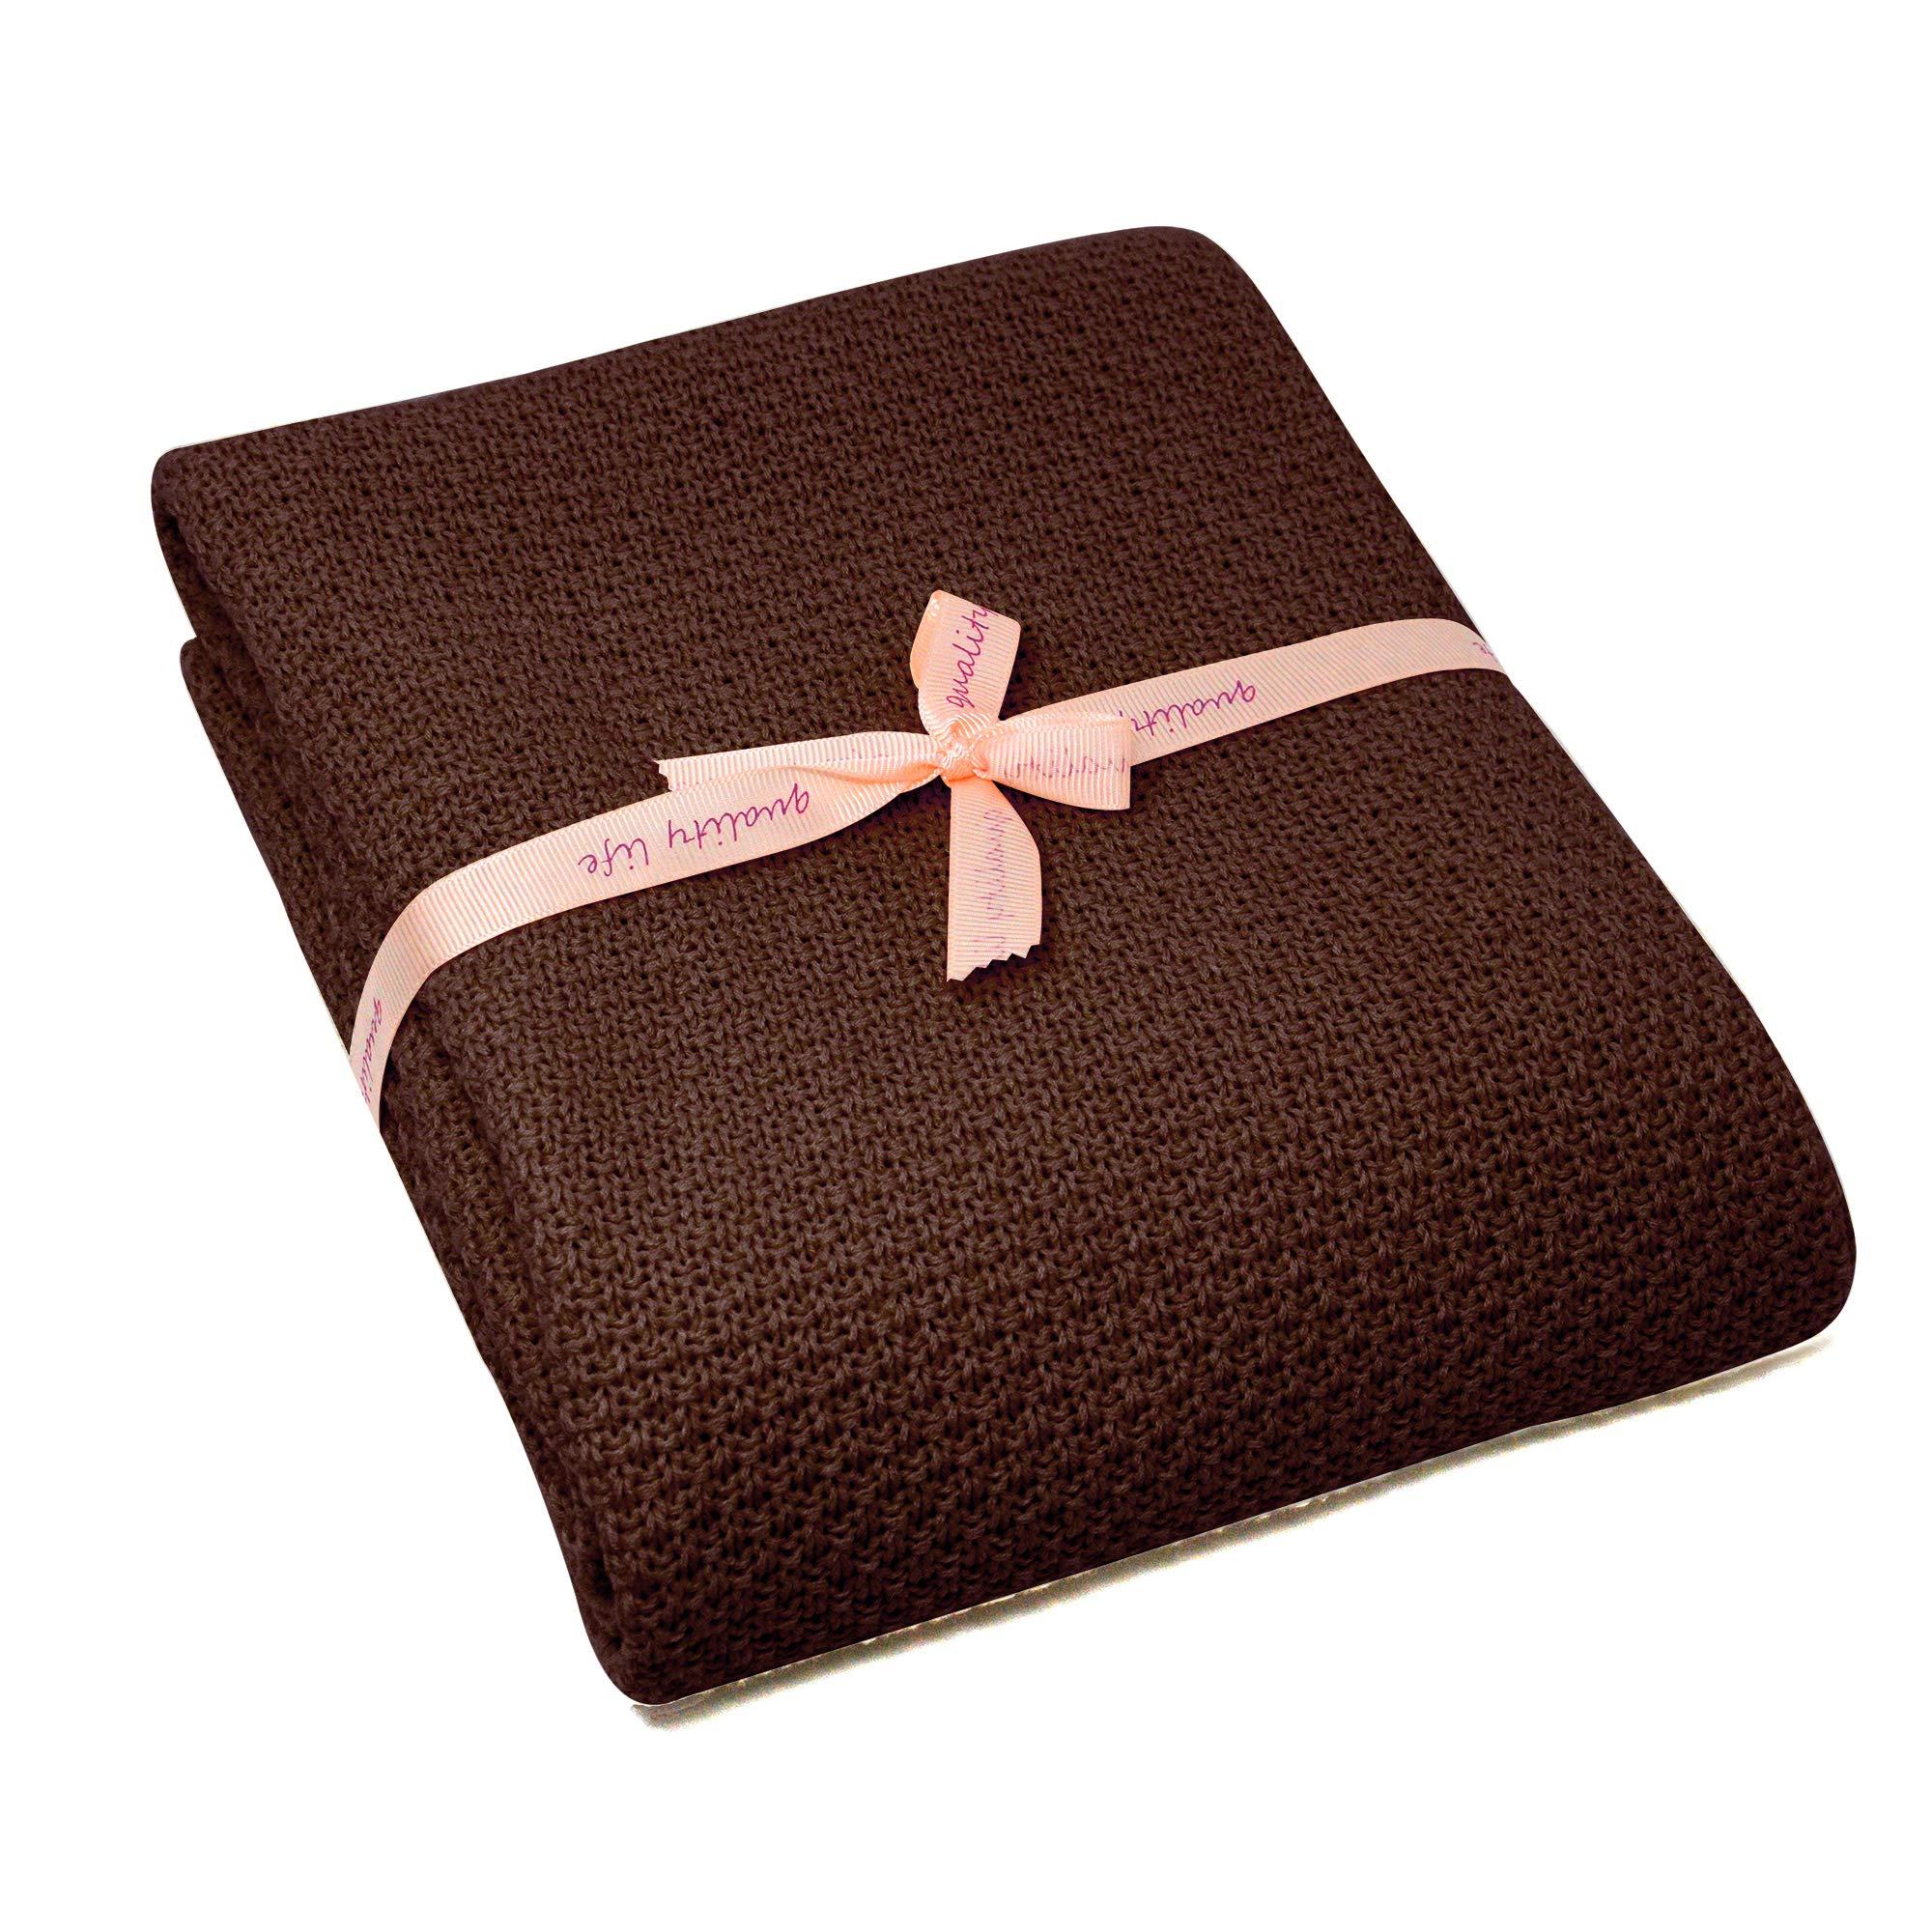 Spring Fever Baby Cozy Newborn Nursery All Season Organic Cotton Knit Bed Stroller Cover Throw Blanket Coffee